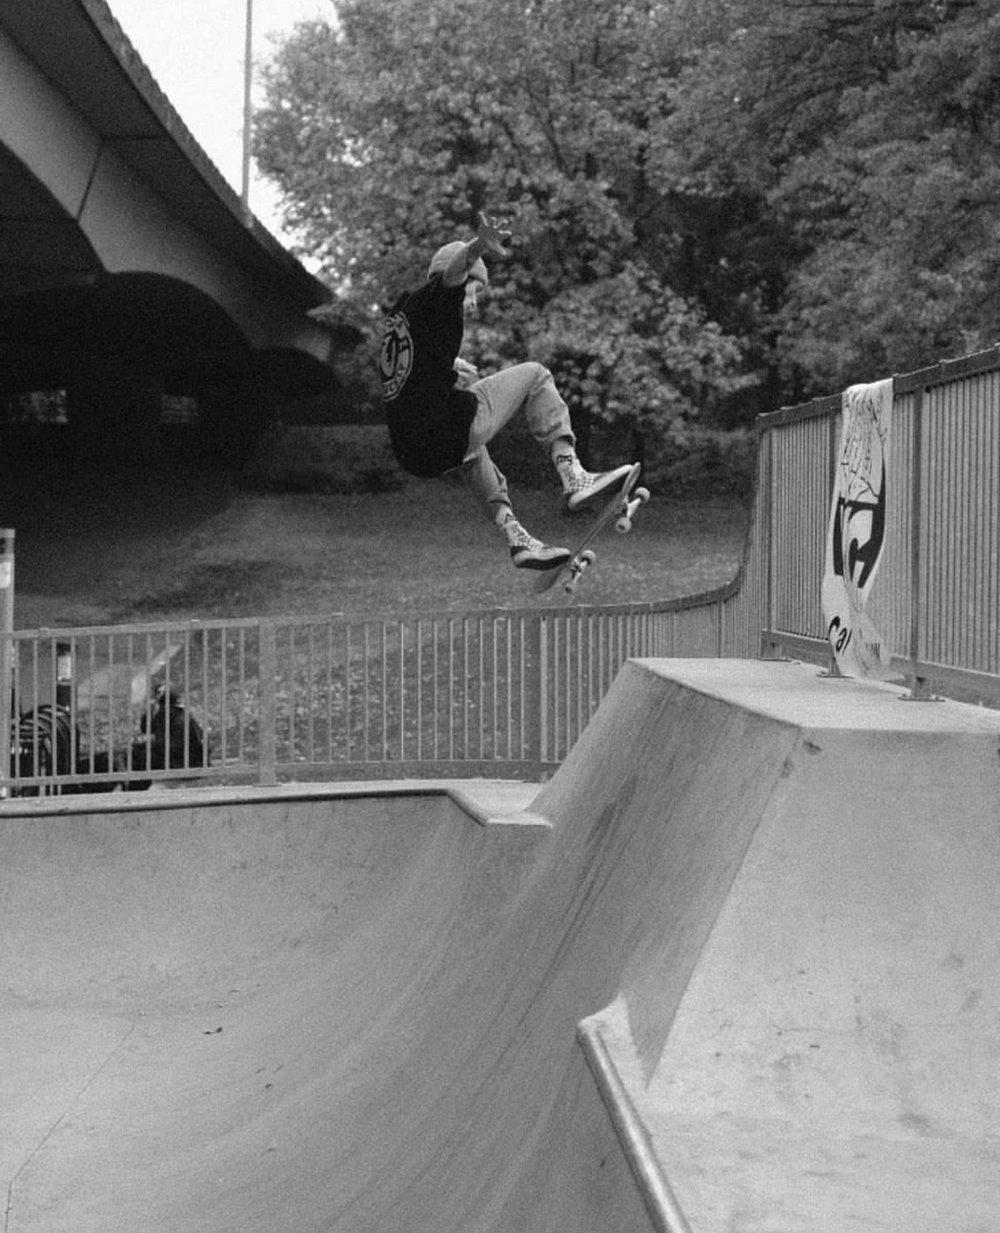 Dylan Chrisman - Fs Ollie - Photo. Sean McMurray